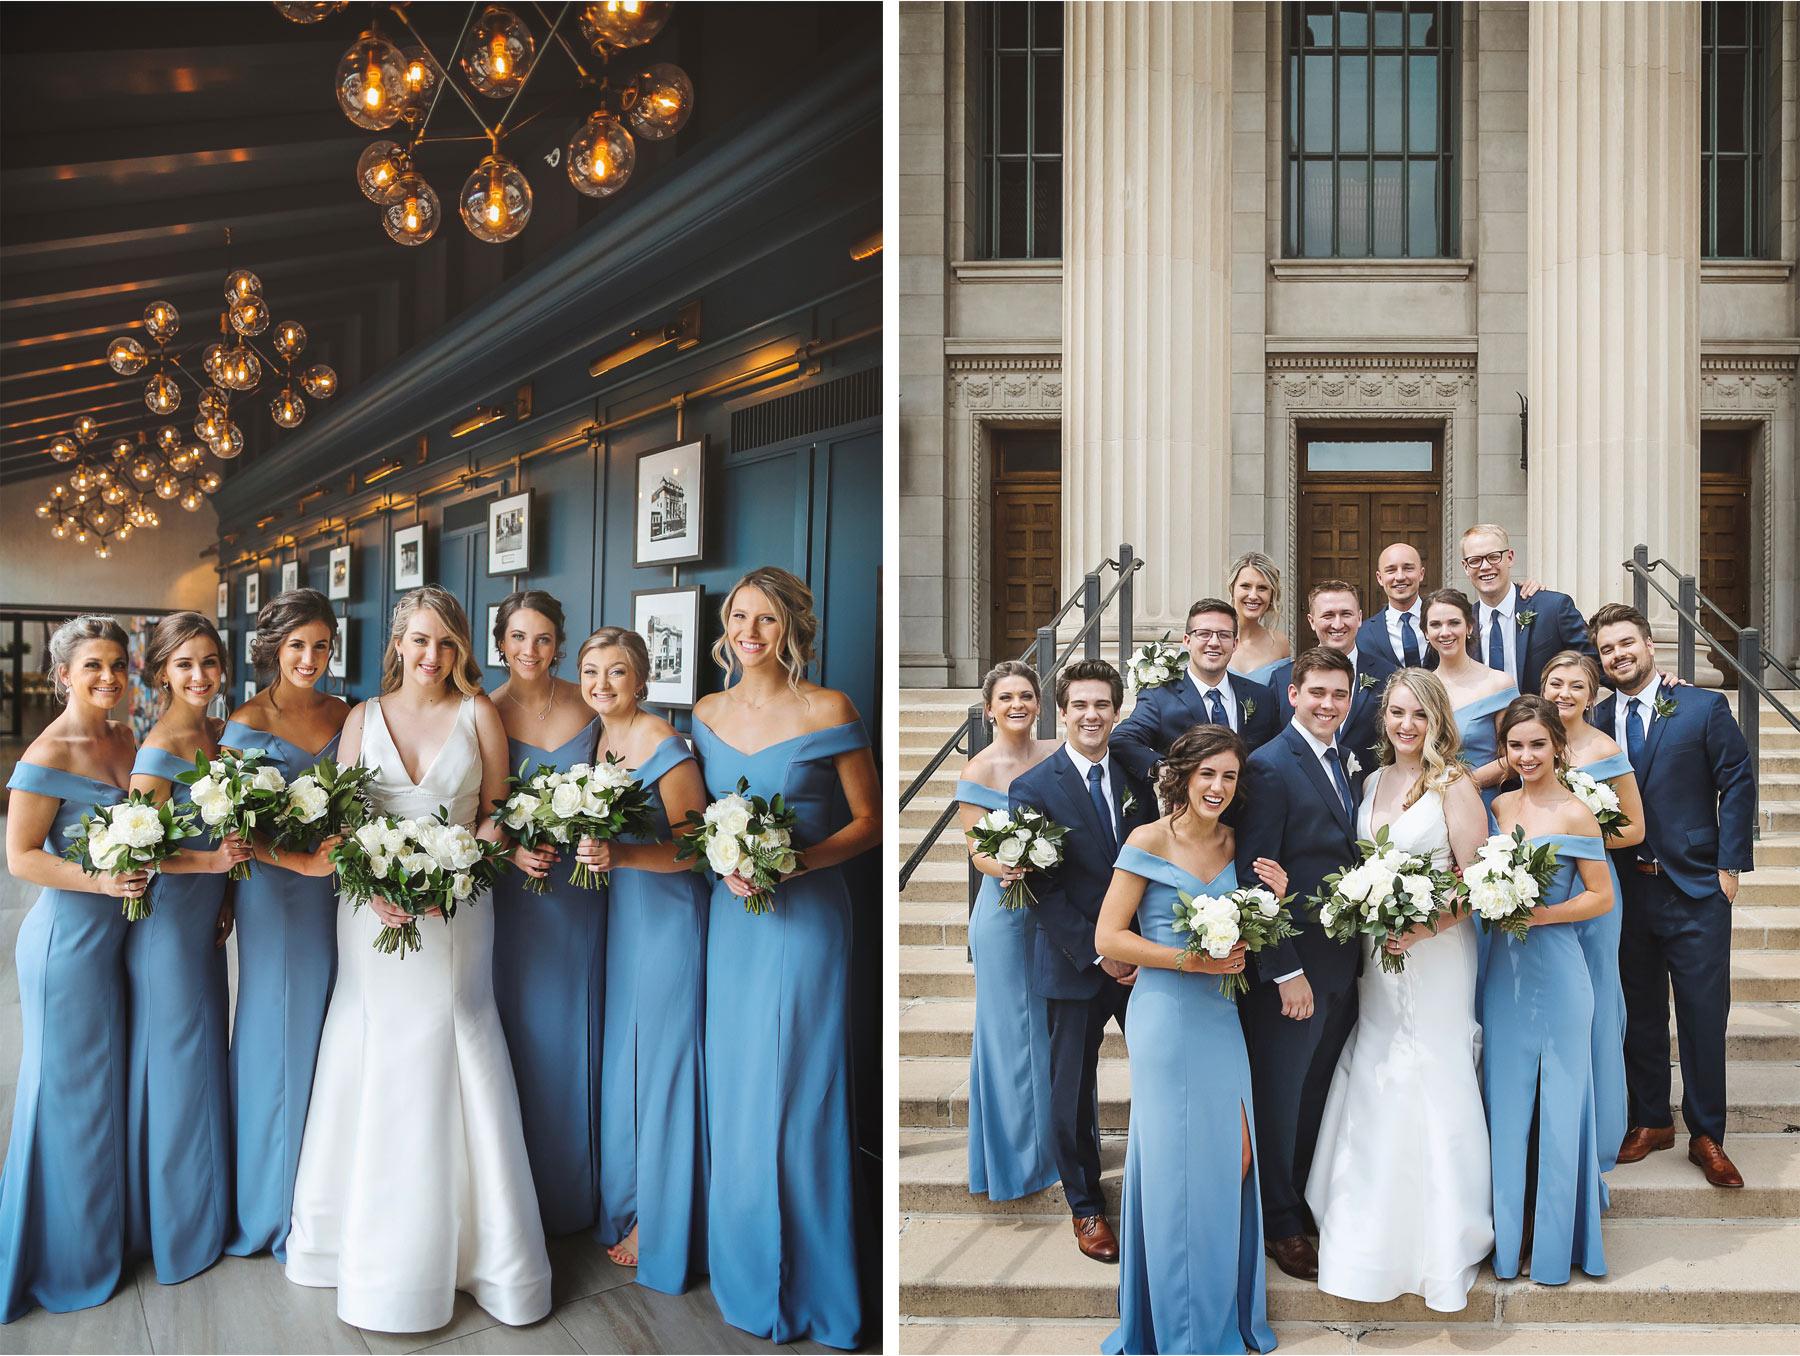 09-Minneapolis-Minnesota-Wedding-Vick-Photography-The-Depot-Bridesmaids-Groomsmen-Amelia-and-Alexander.jpg